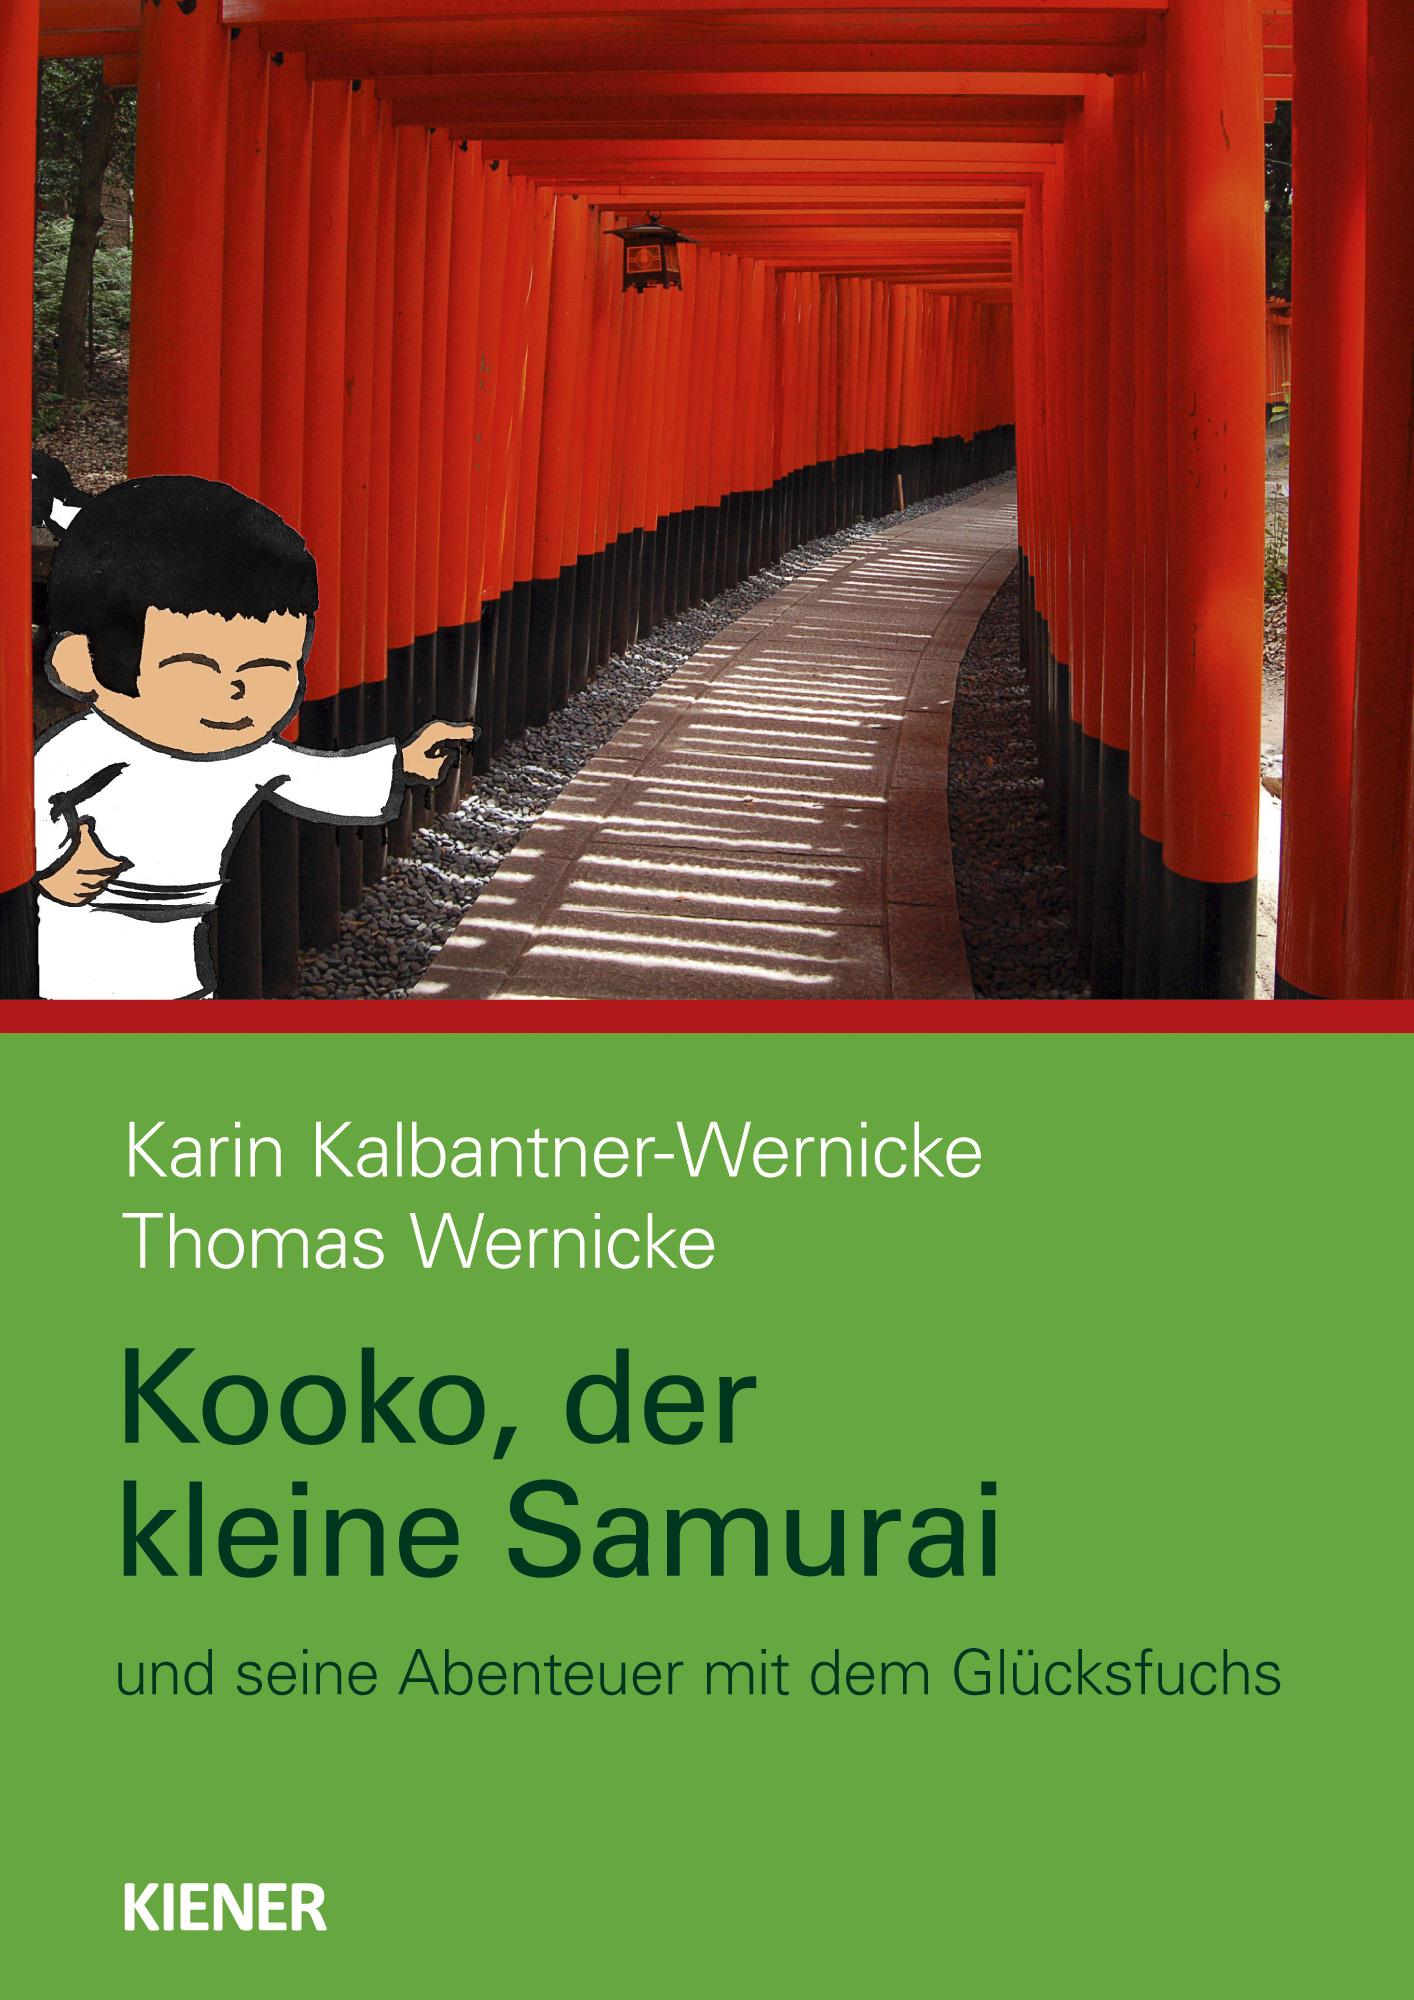 Karin Kalbantner-Wernicke ~ Kooko, der kleine Samurai 9783943324235